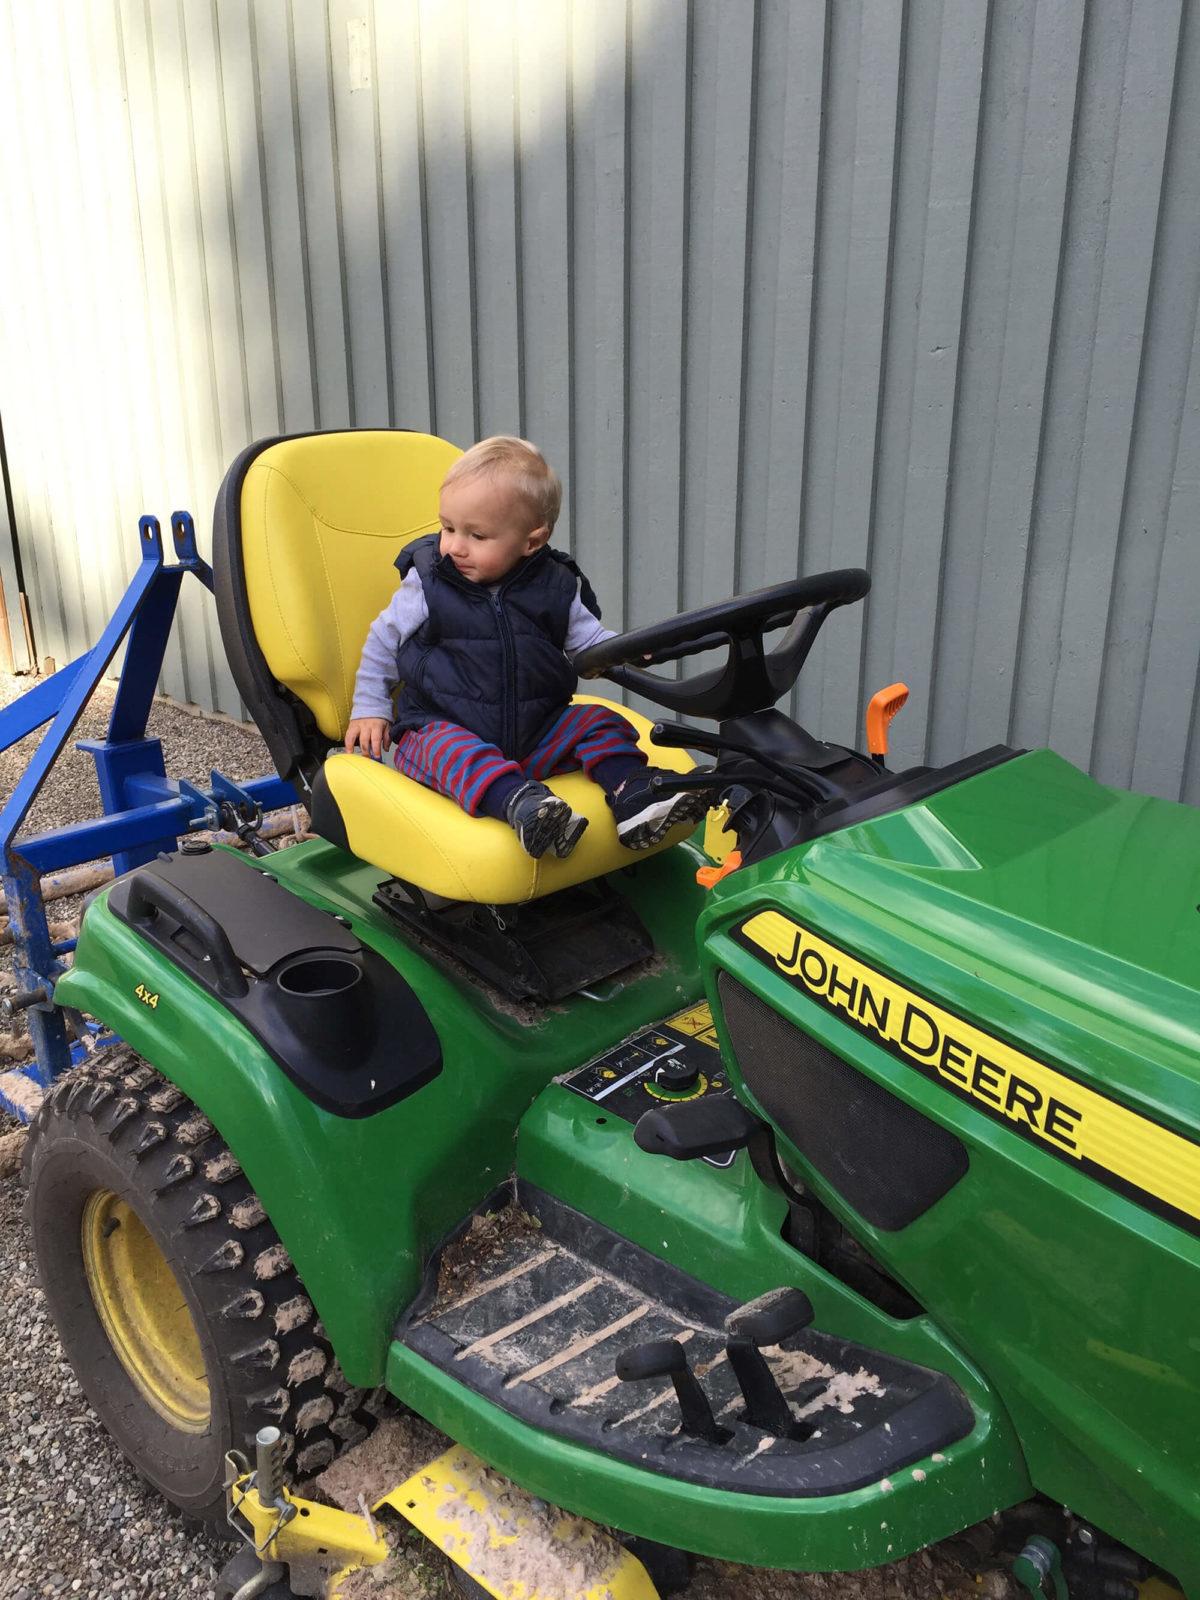 Litet barn sitter på en liten traktor